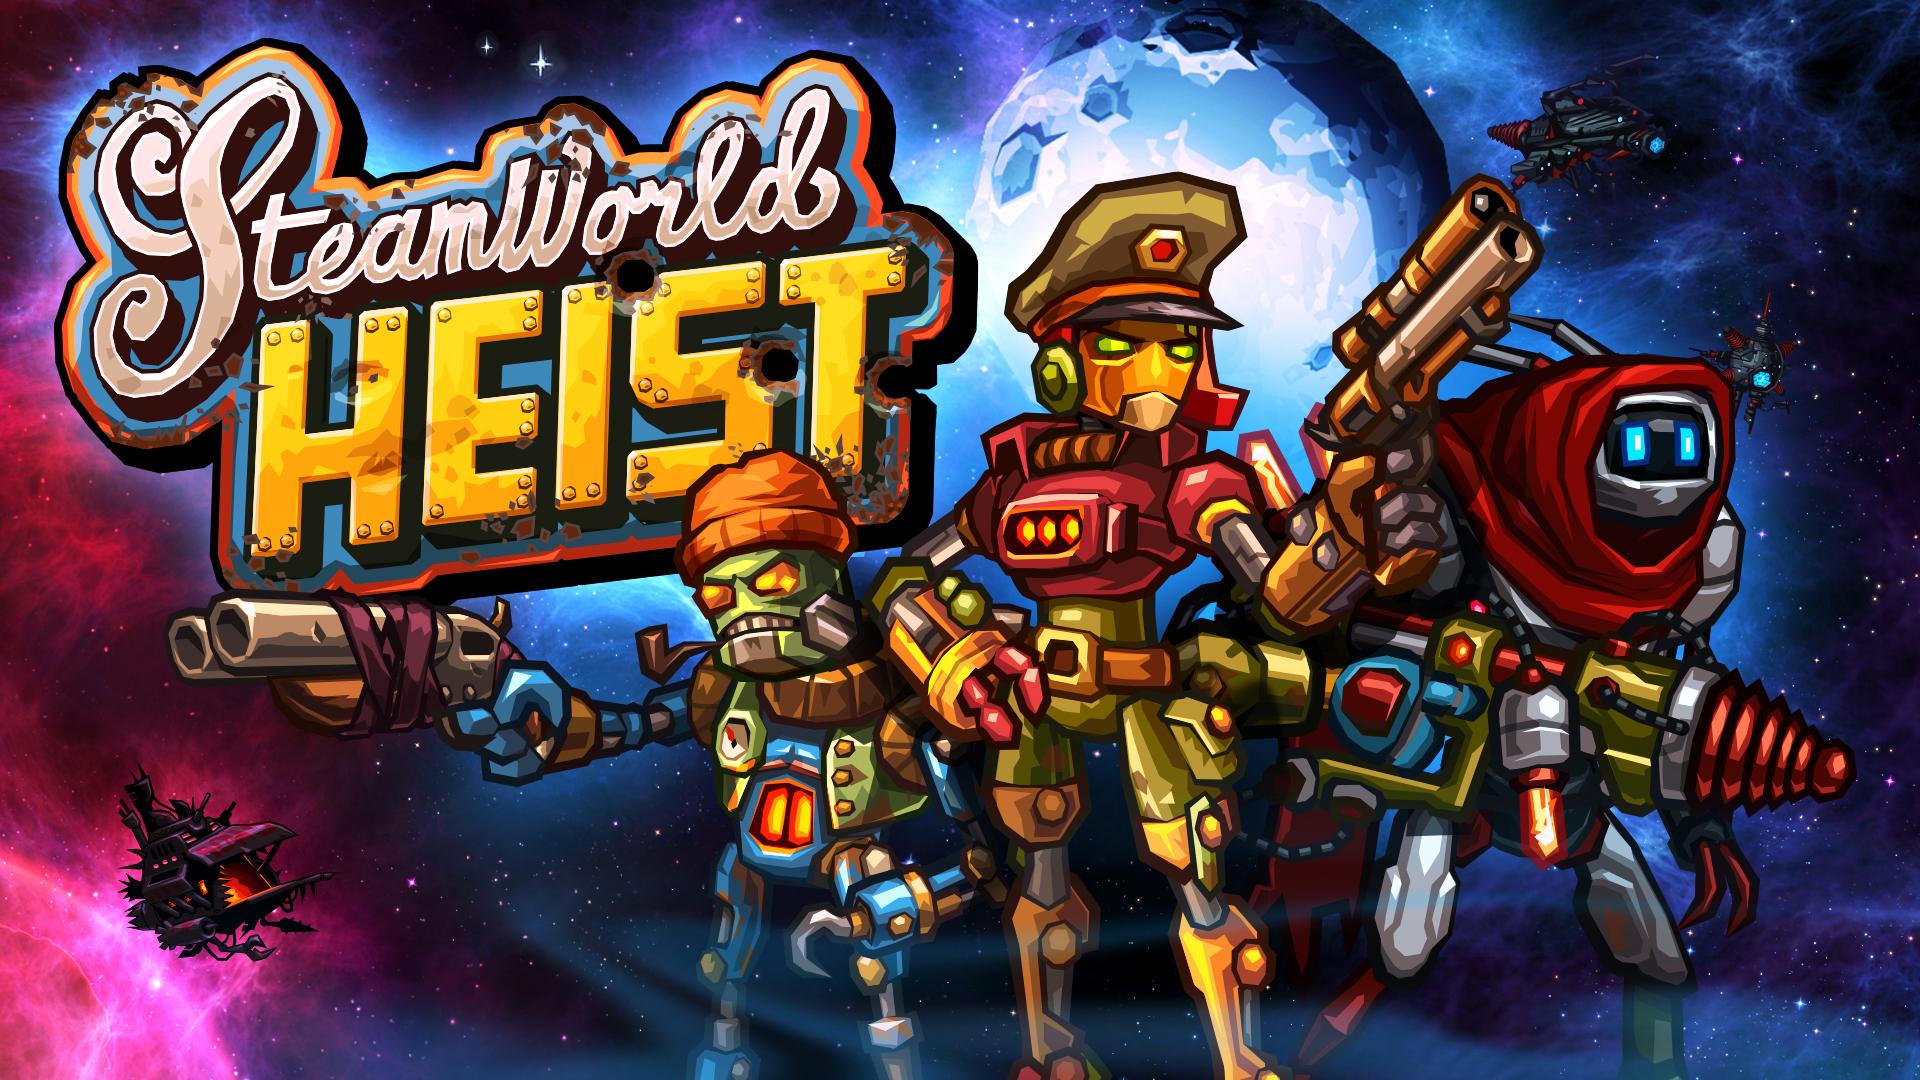 SteamWorld Heist: Ultimate Edition - Nintendo Switch Digital Download - $4.99 @ Nintendo Game Store